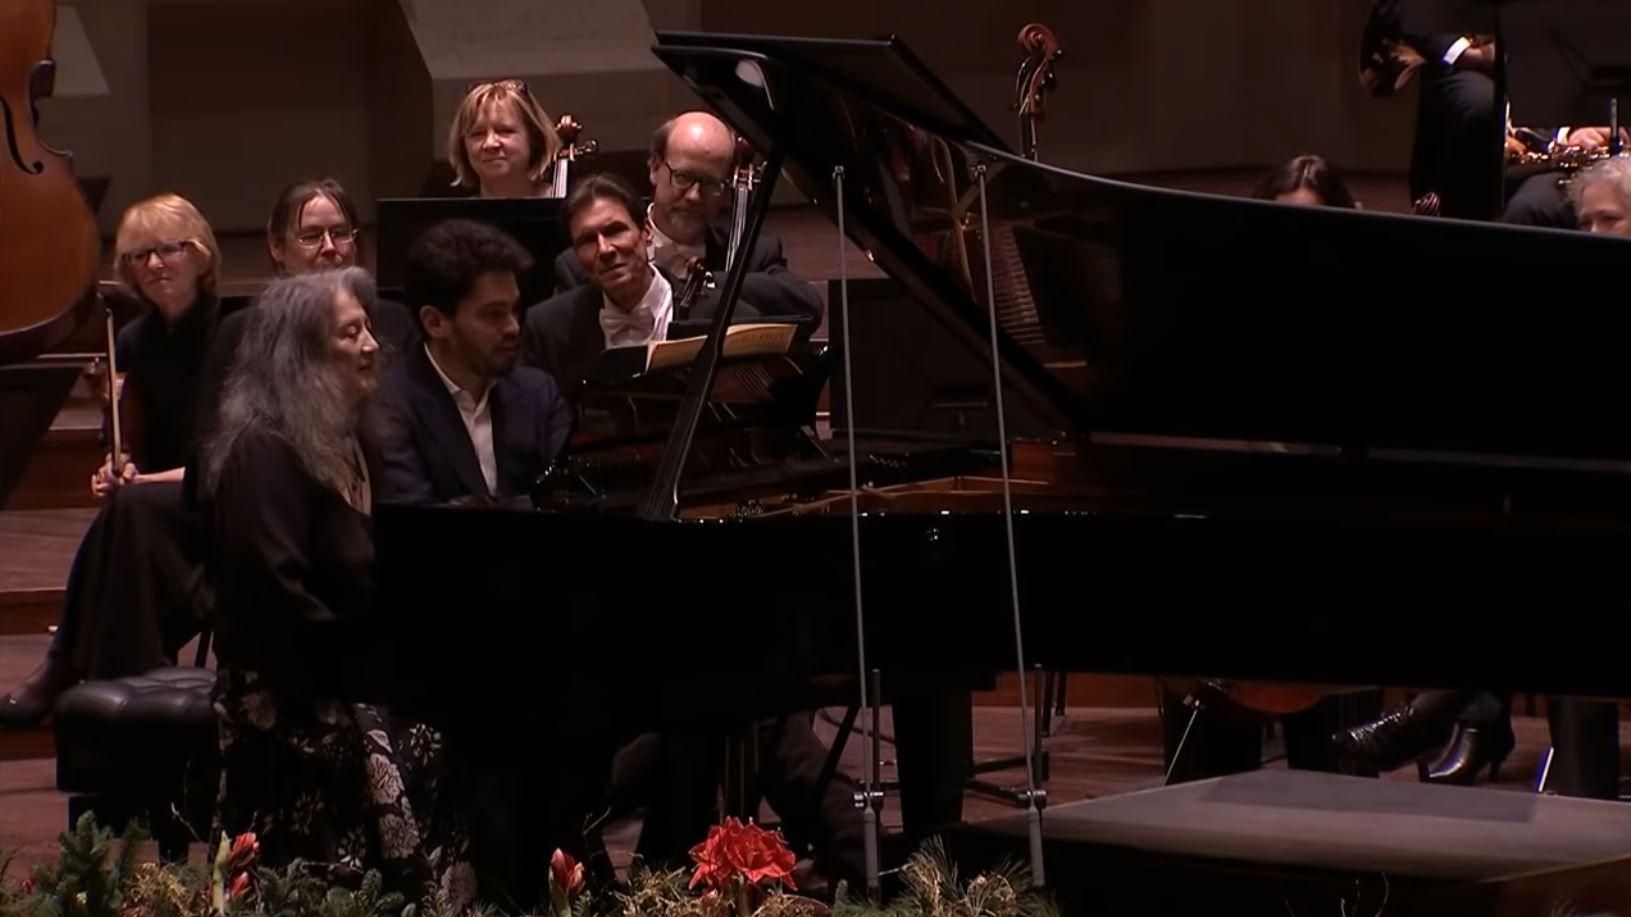 Sergei Prokofiev Piano Concerto No 3 In C Major Martha Argerich Rotterdam Philharmonic Orchestra Lahav Shani Classical Music Concert New Music